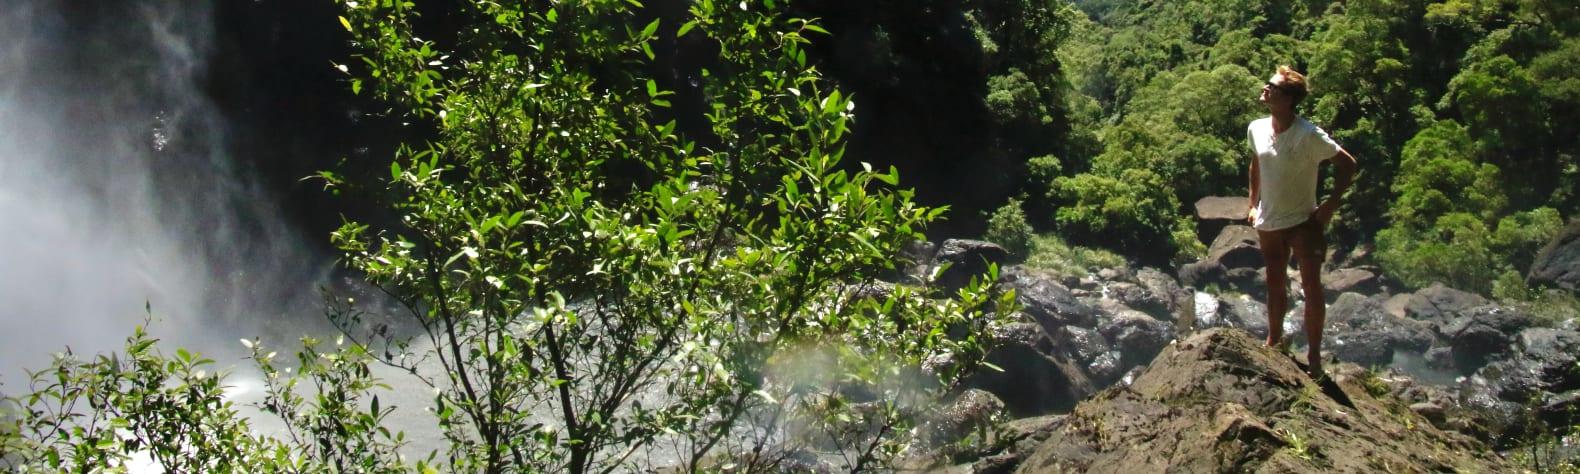 Biriwal Bulga National Park